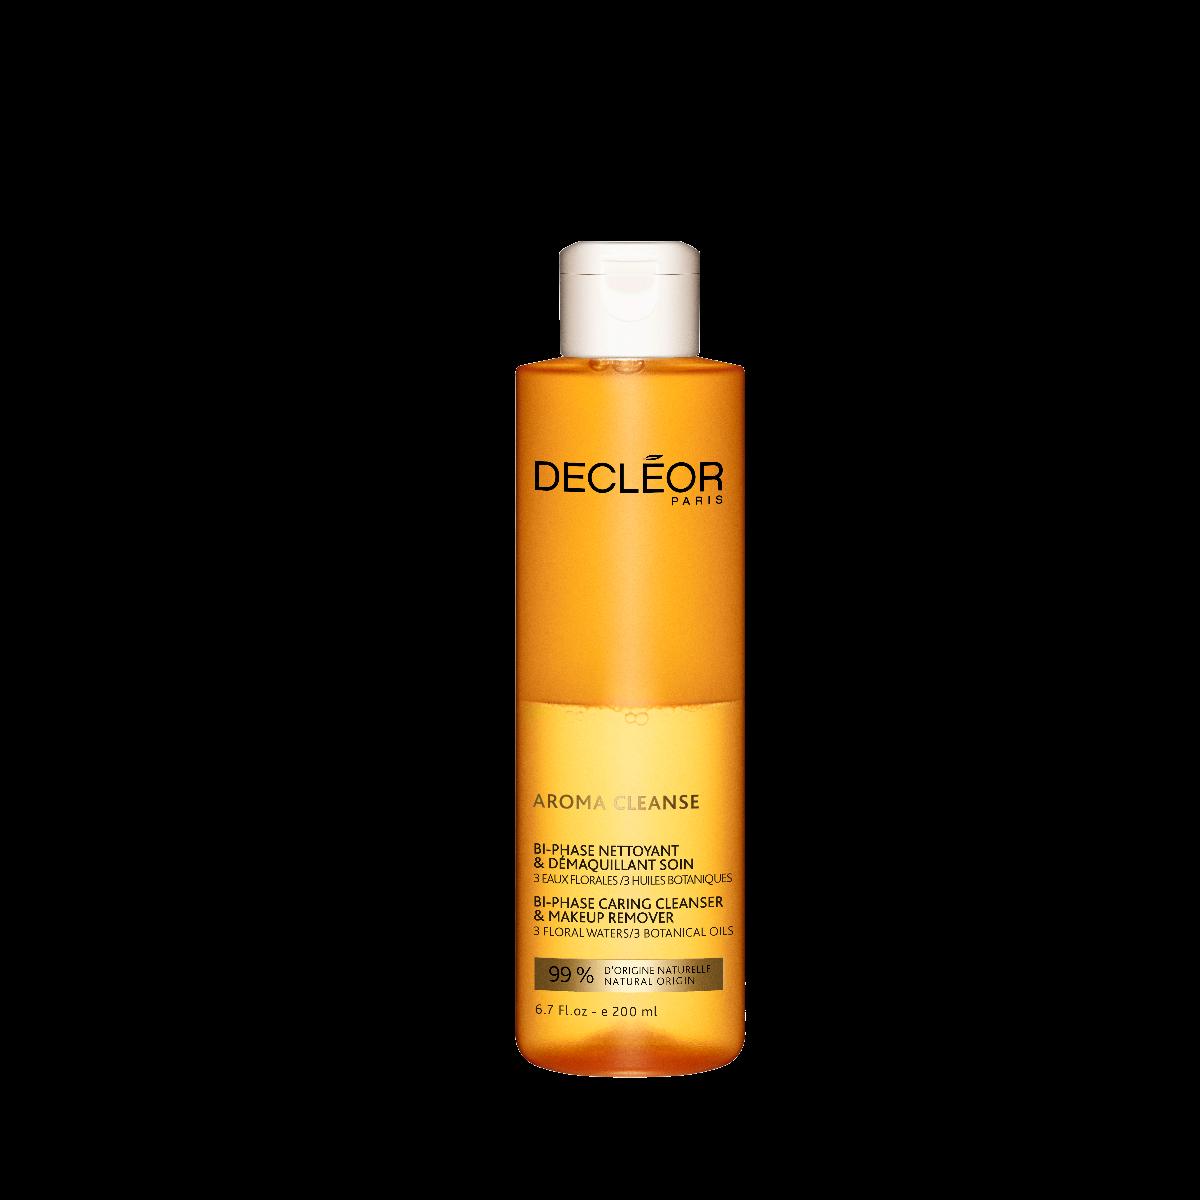 Decléor - Aroma Cleanse - Bi-Phase Nettoyant & Démaquillant 200 ml